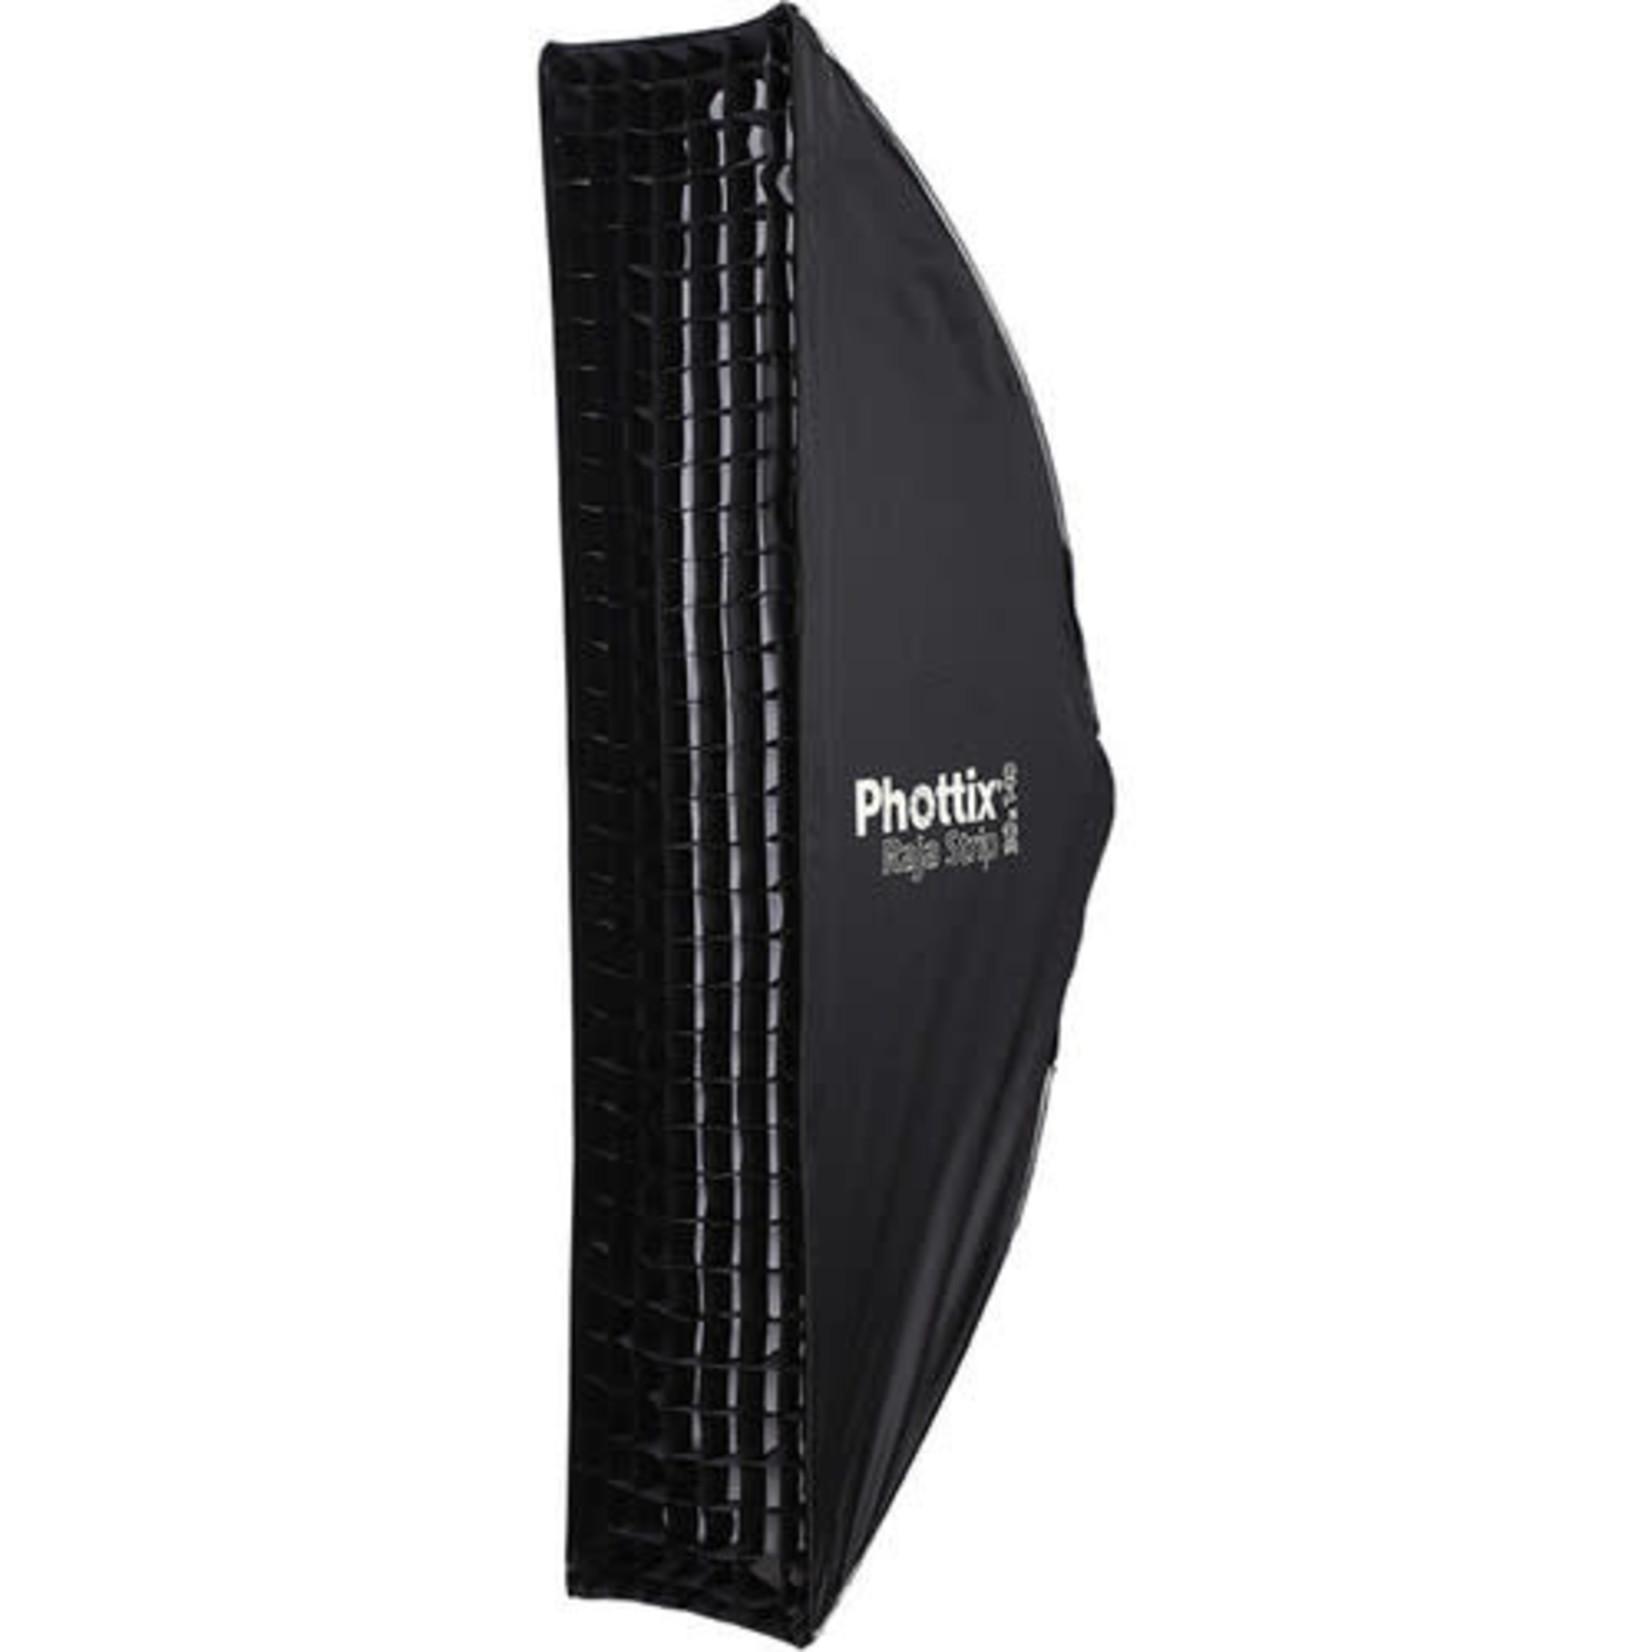 Phottix Raja Quick-Folding Strip Softbox 12x55in (30x140cm)